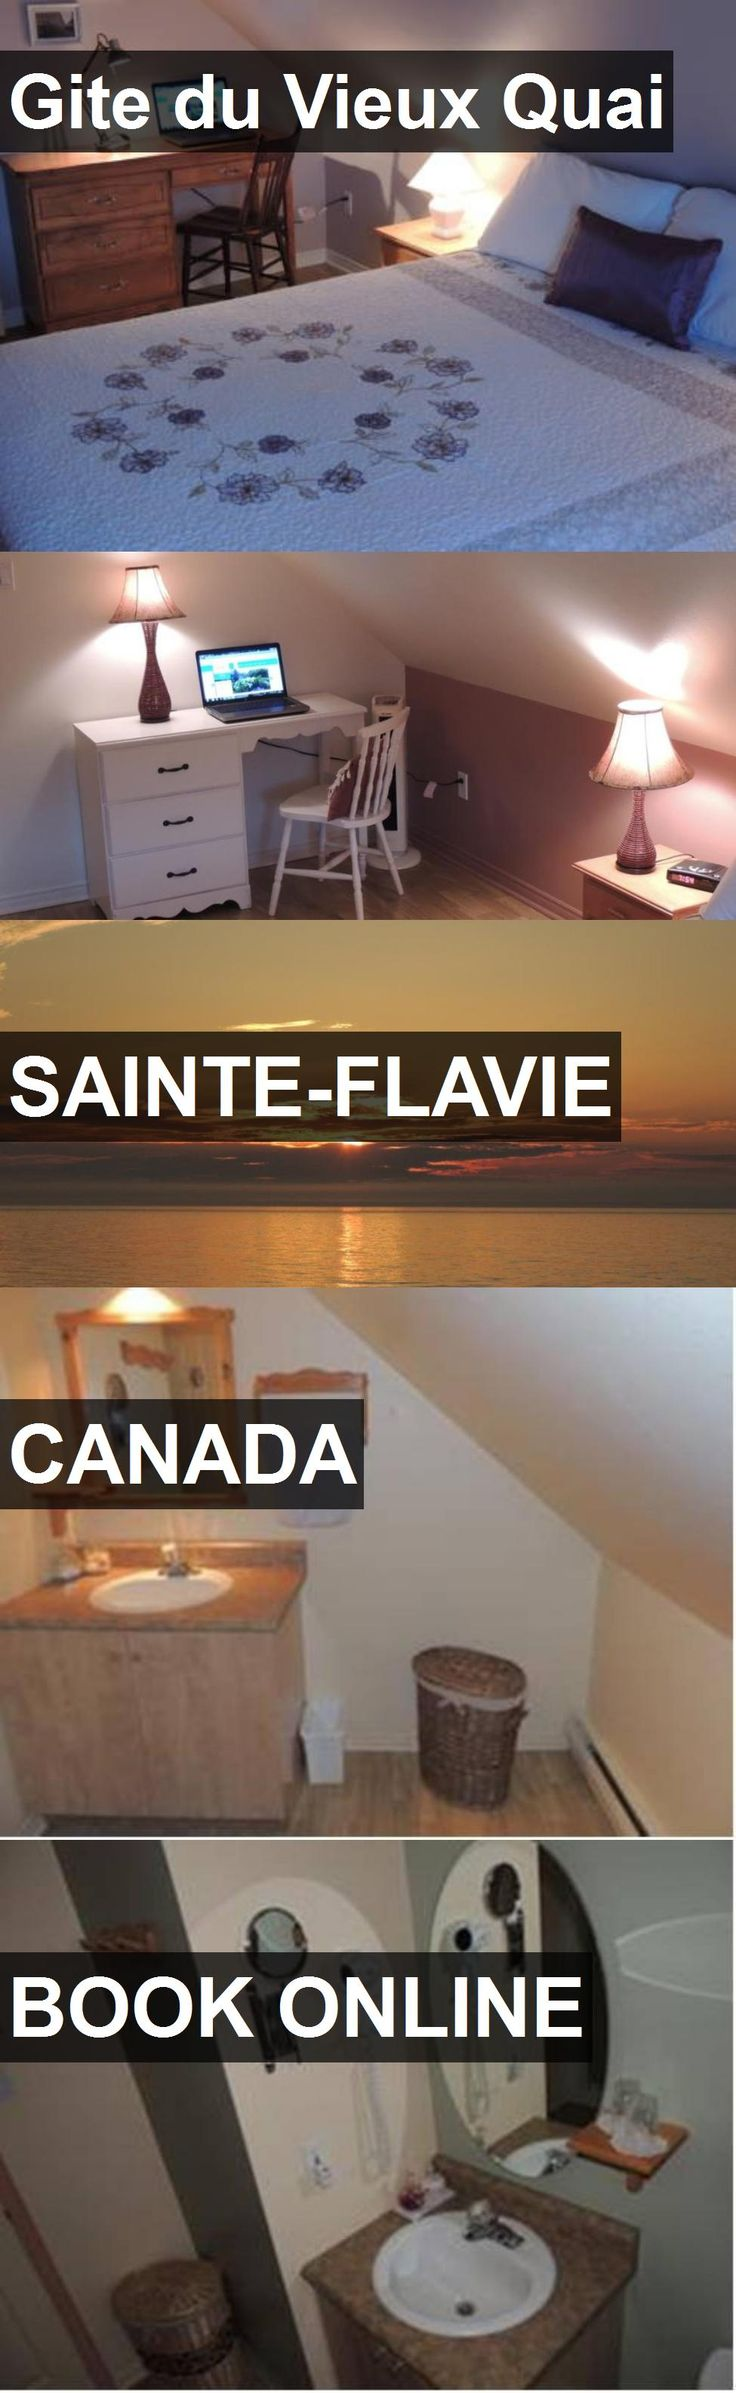 Hotel Gite du Vieux Quai in Sainte-Flavie, Canada. For more information, photos, reviews and best prices please follow the link. #Canada #Sainte-Flavie #GiteduVieuxQuai #hotel #travel #vacation